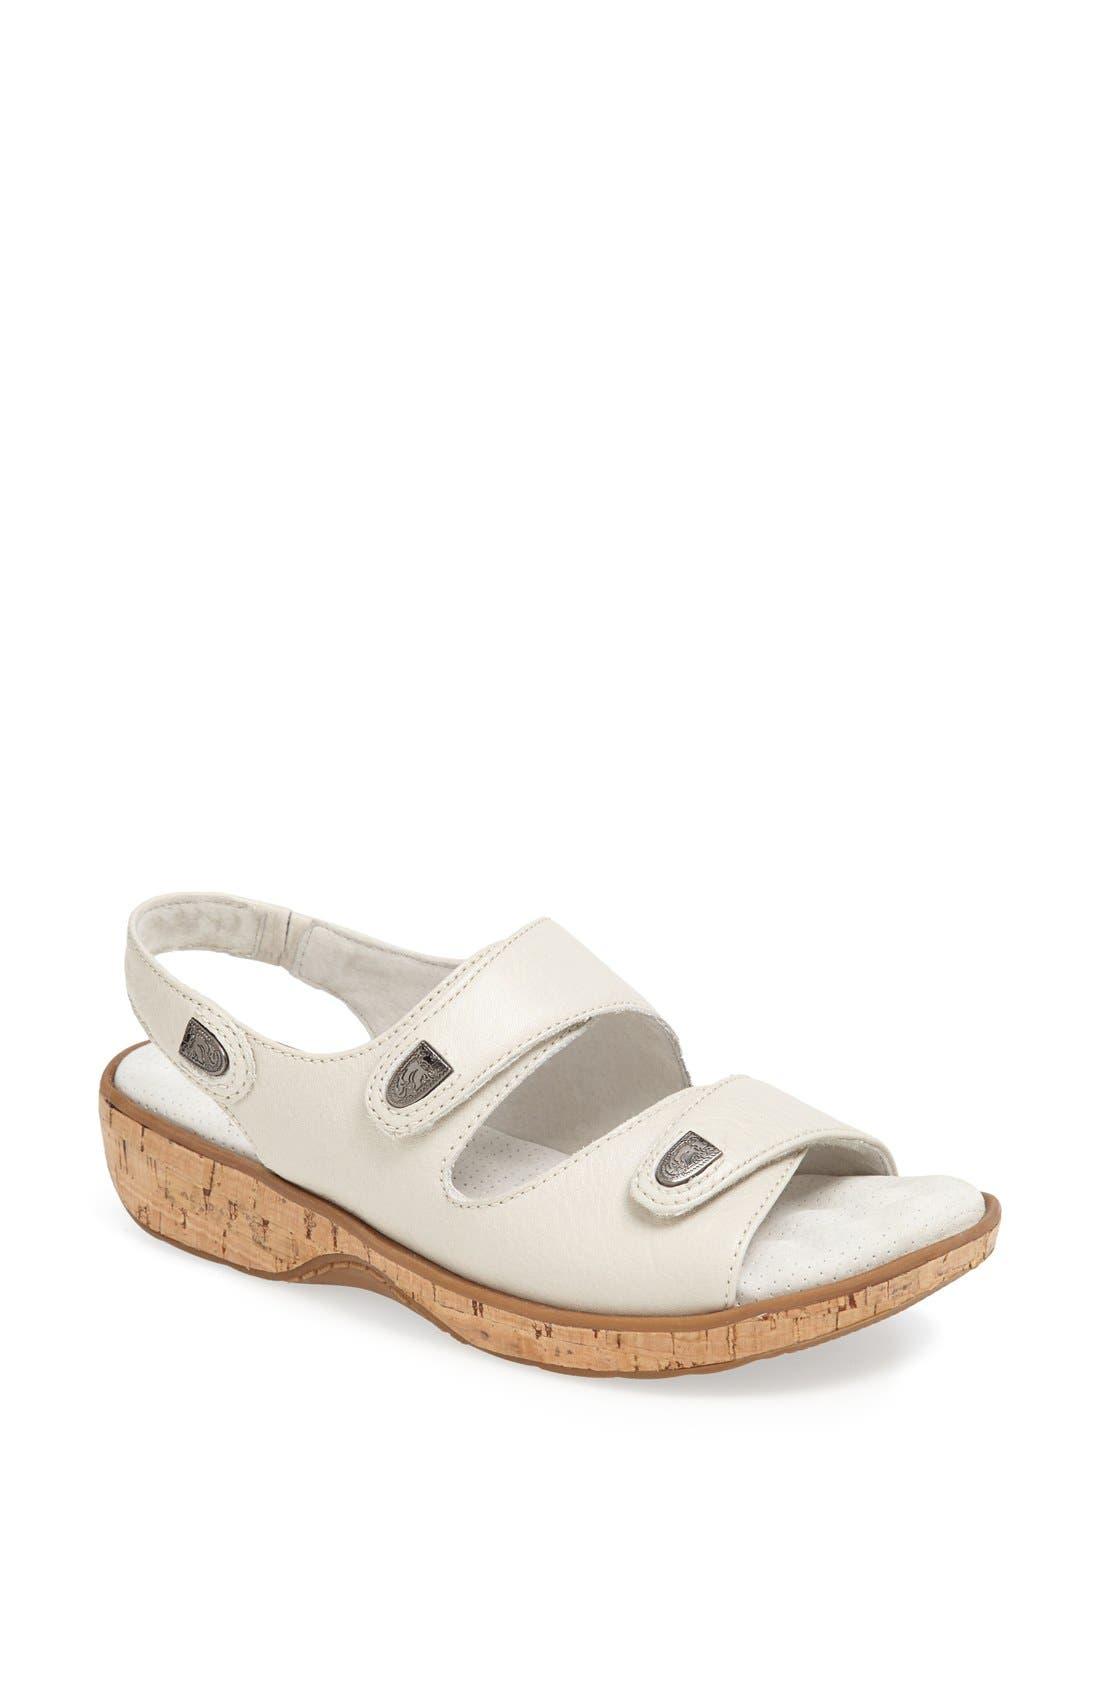 'Bolivia' Sandal,                         Main,                         color, OFF WHITE